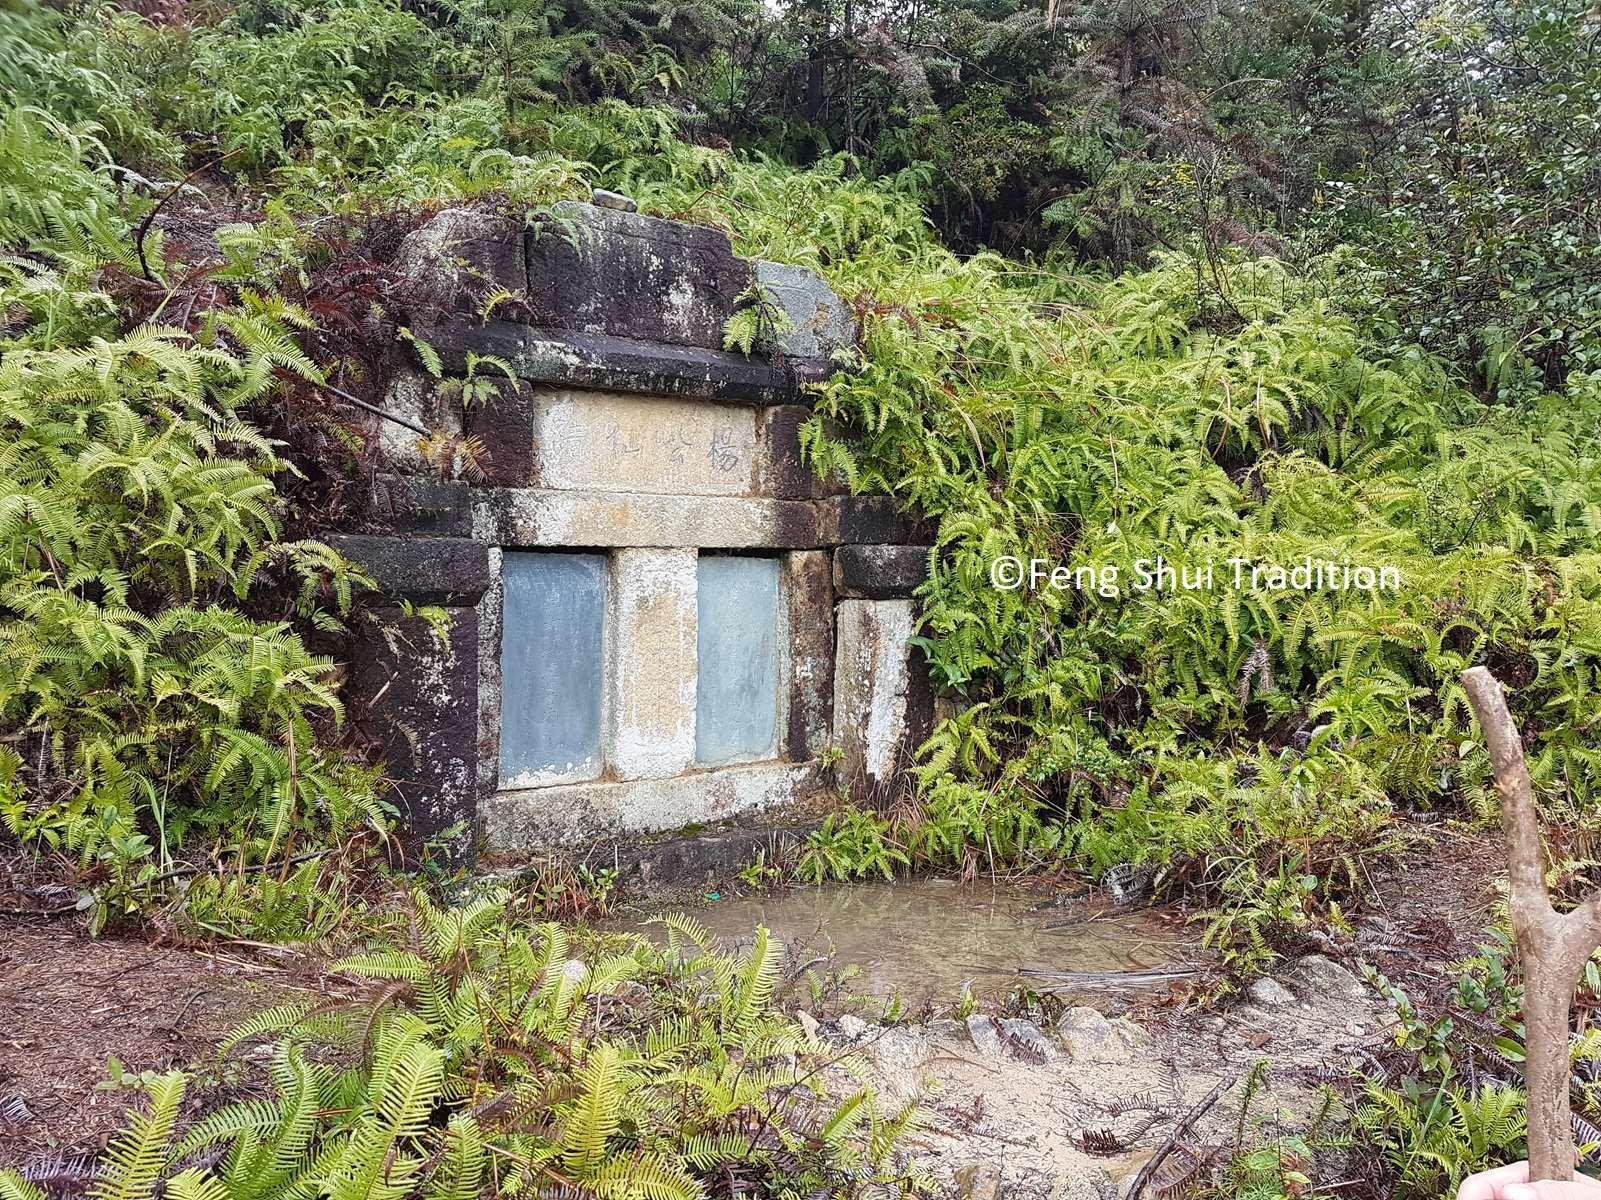 Etude d'une tombe en Chine - Yin Feng Shui - Luc Torralba